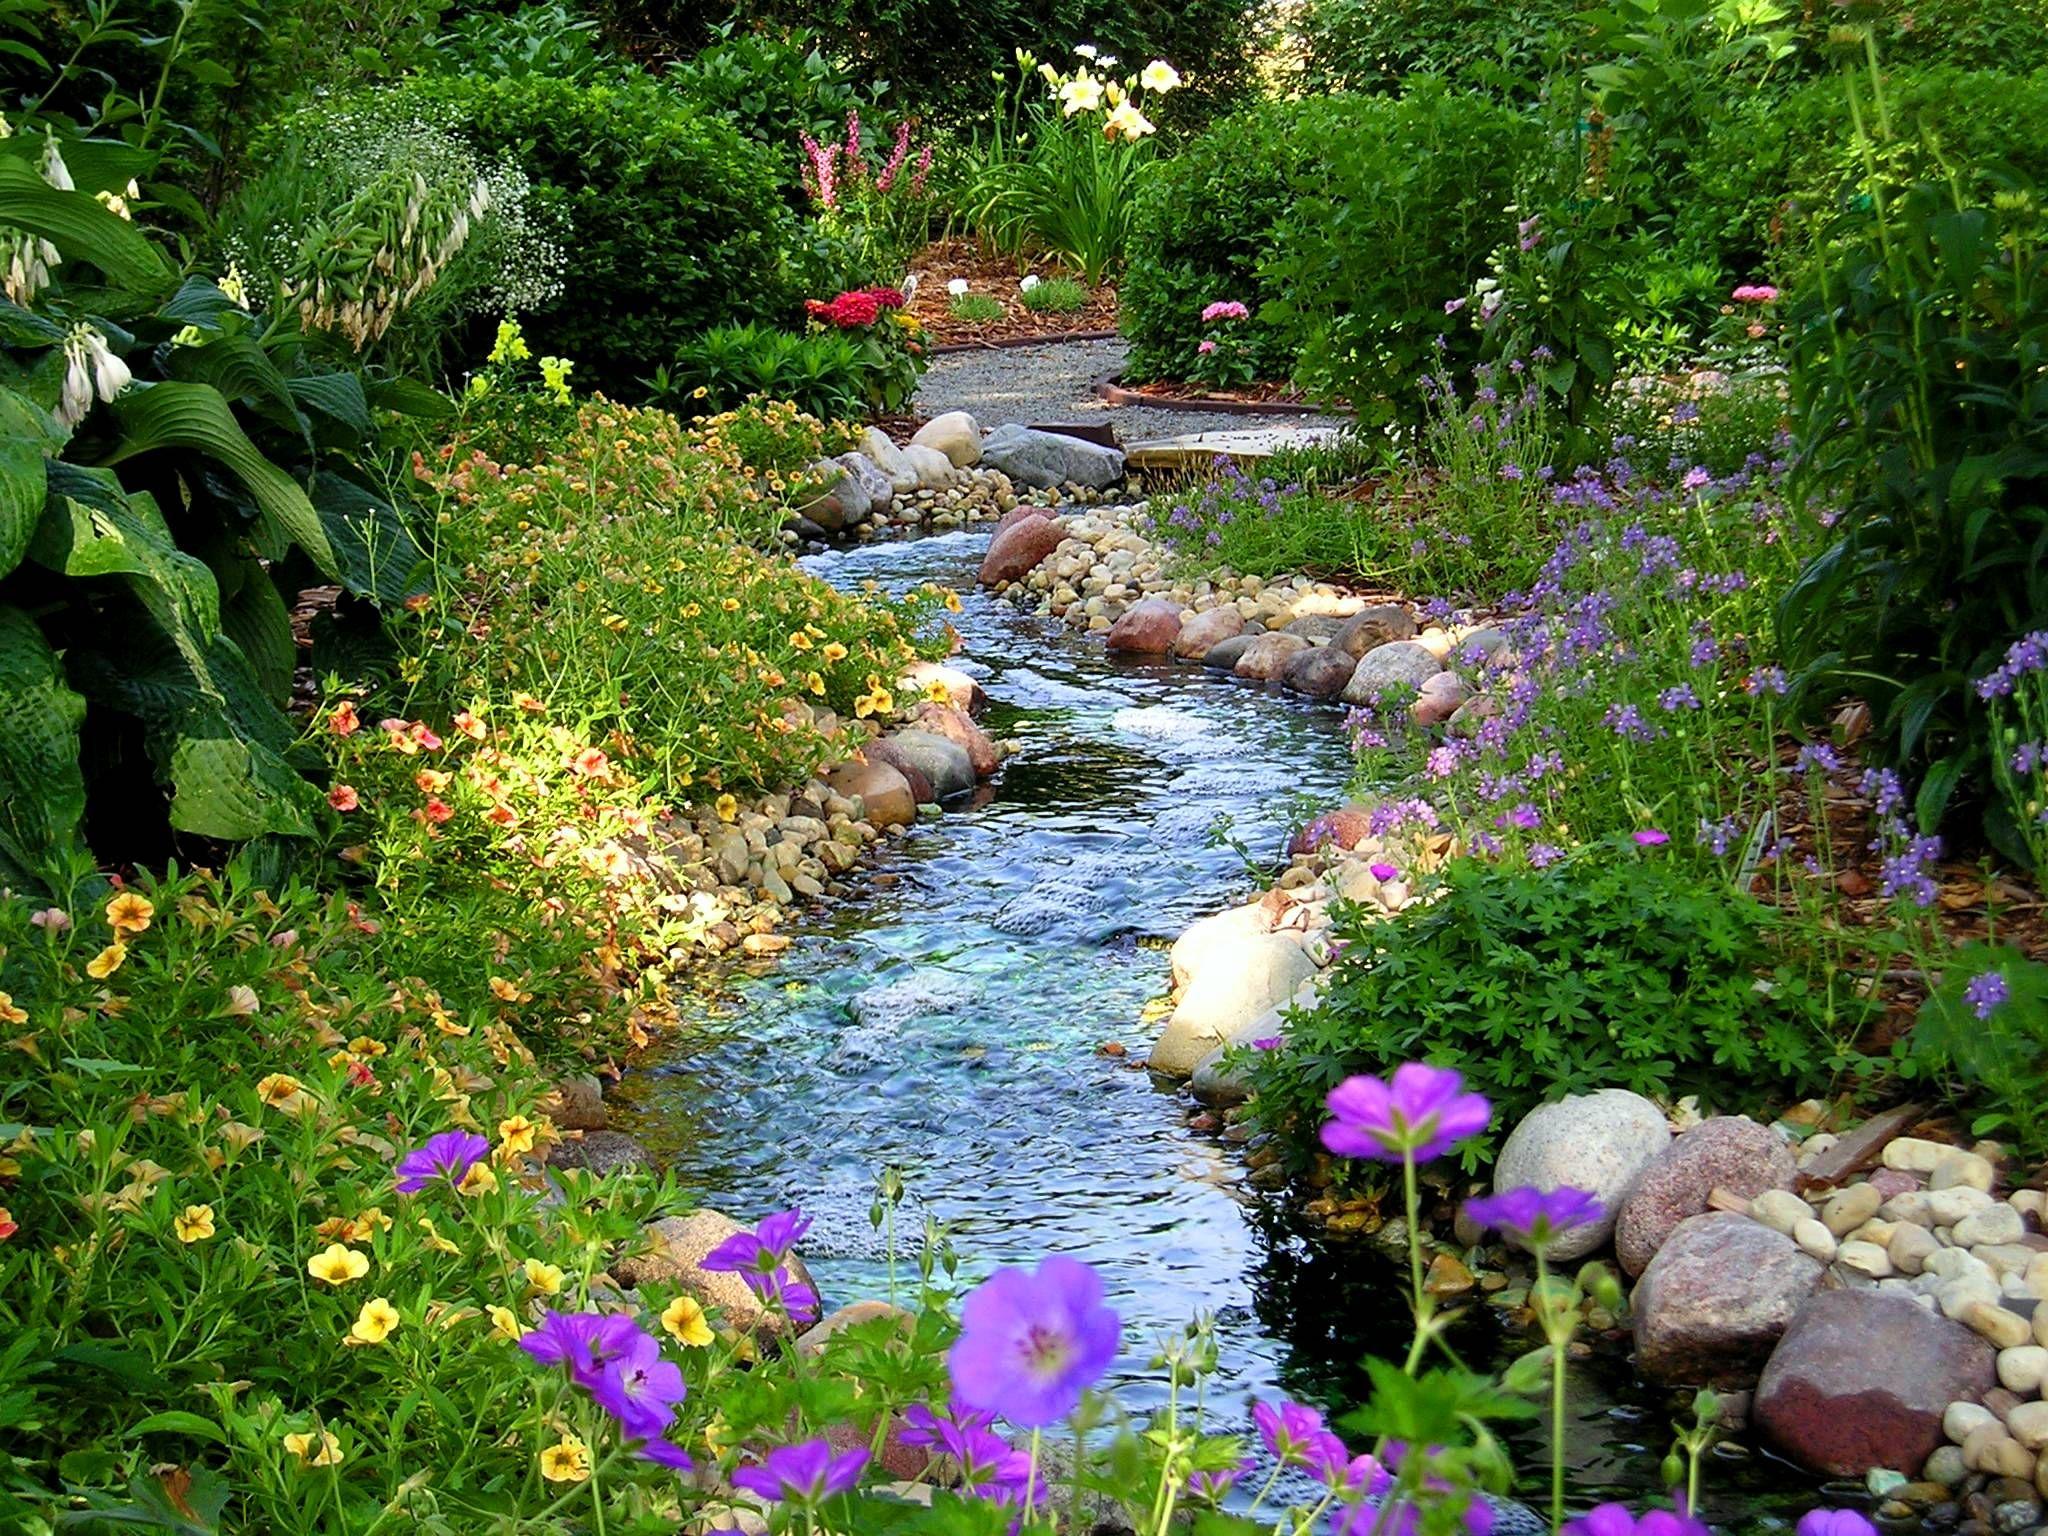 A long stream bed meanders through the garden